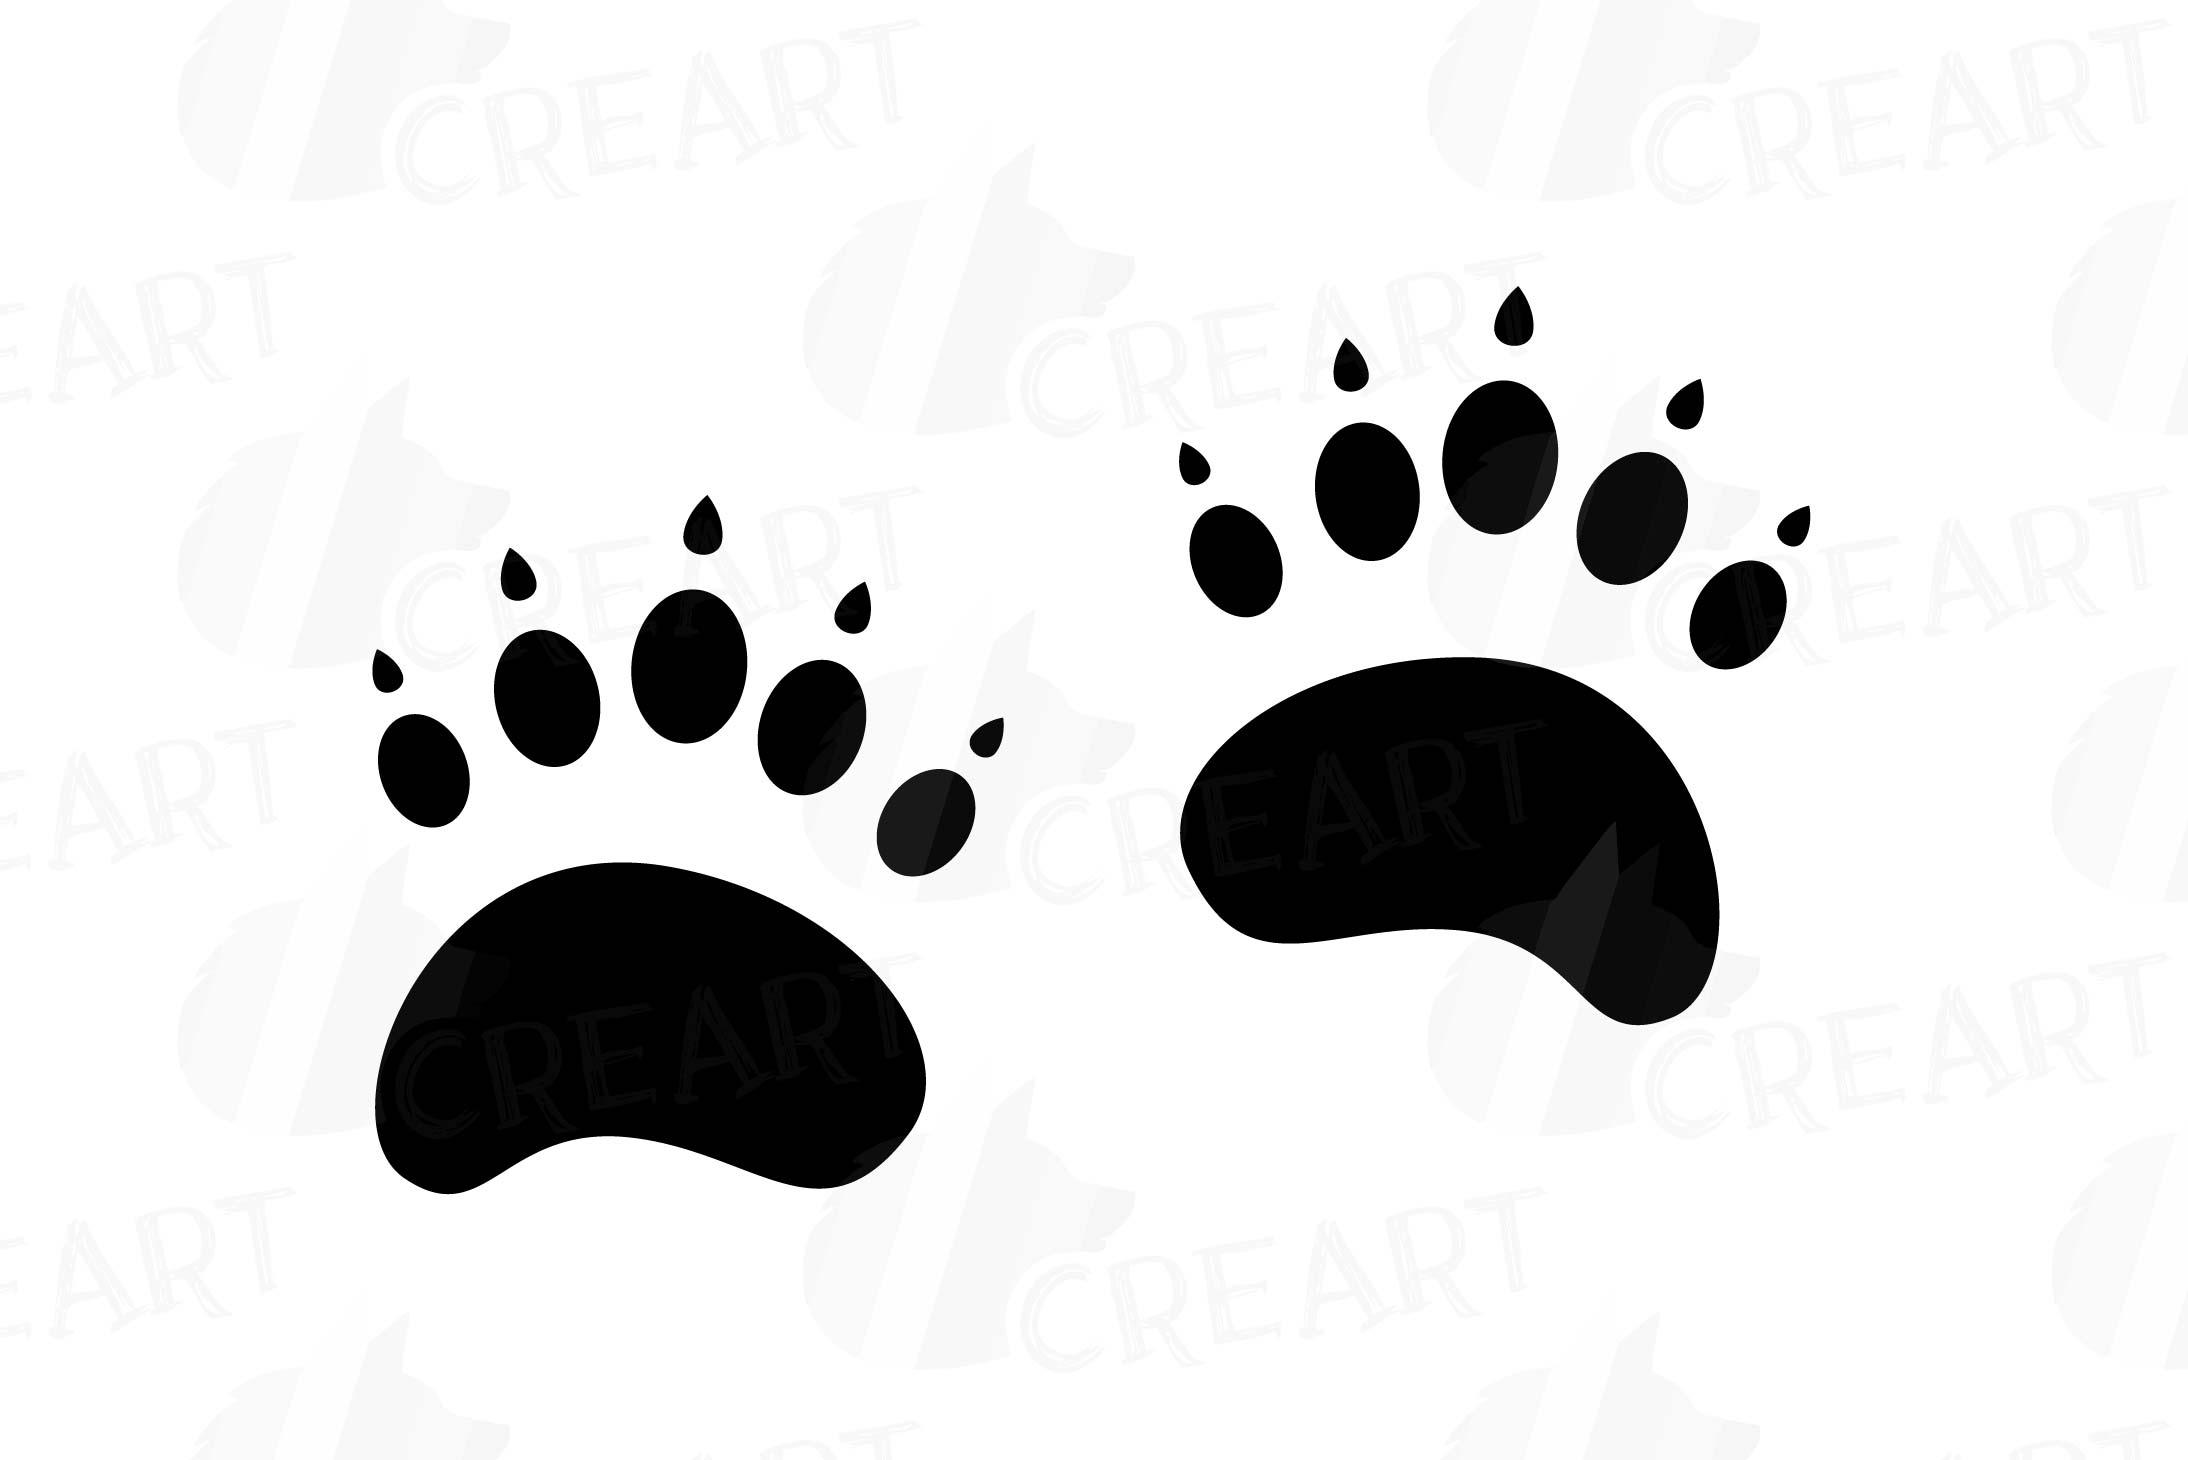 Woodland animal footprint clipart graphic royalty free library Animal Tracks, Woodland Animals footprints Clipart pack graphic royalty free library